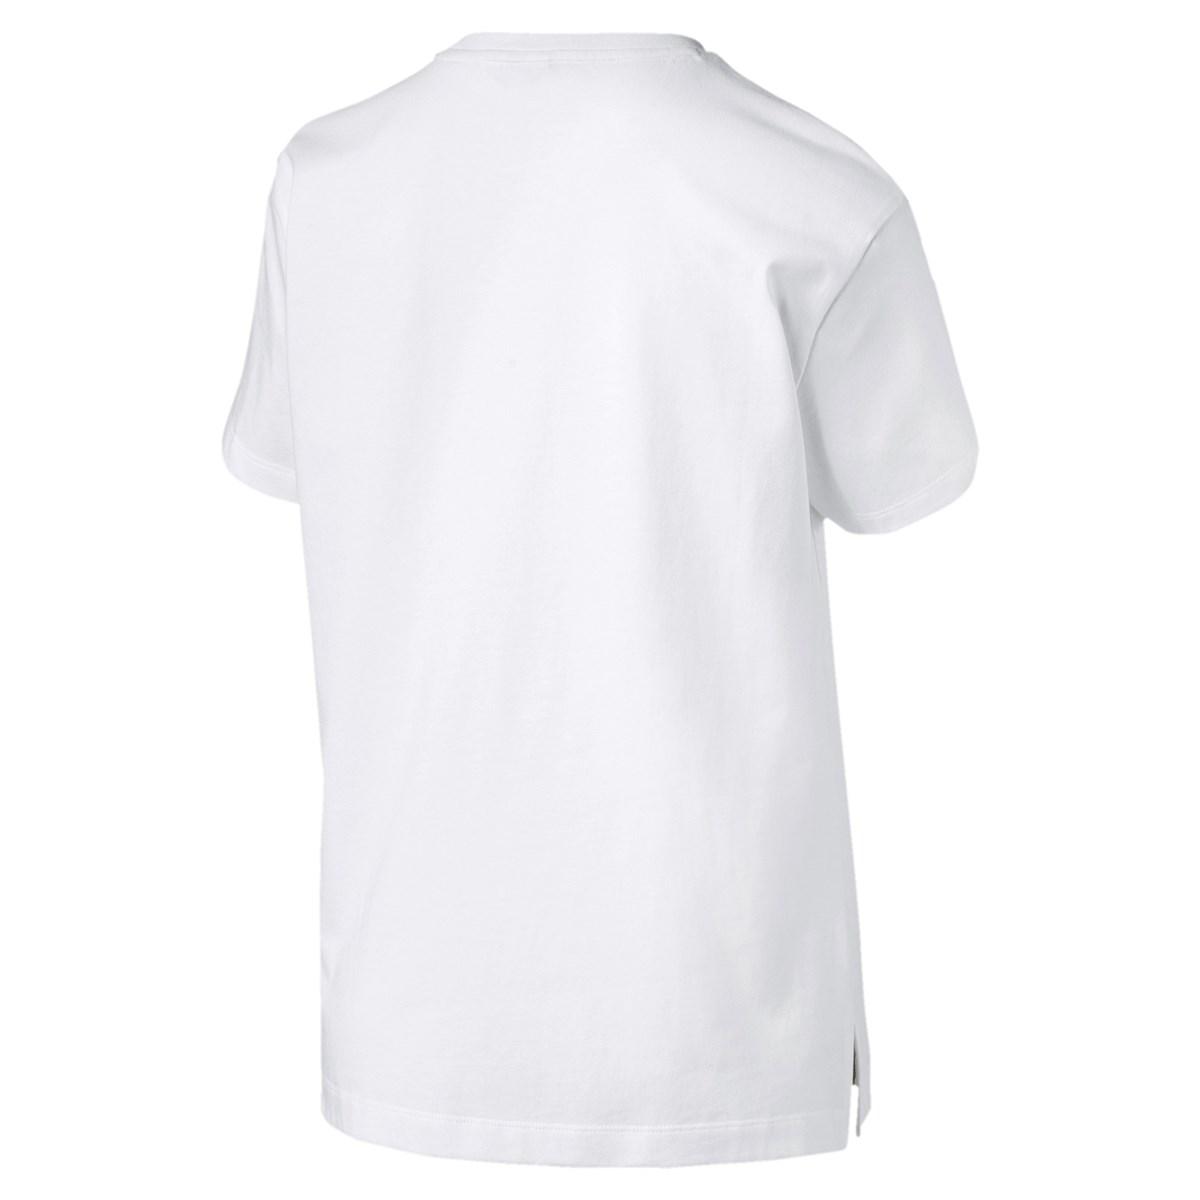 Classics Logo Kadın Beyaz Tişört